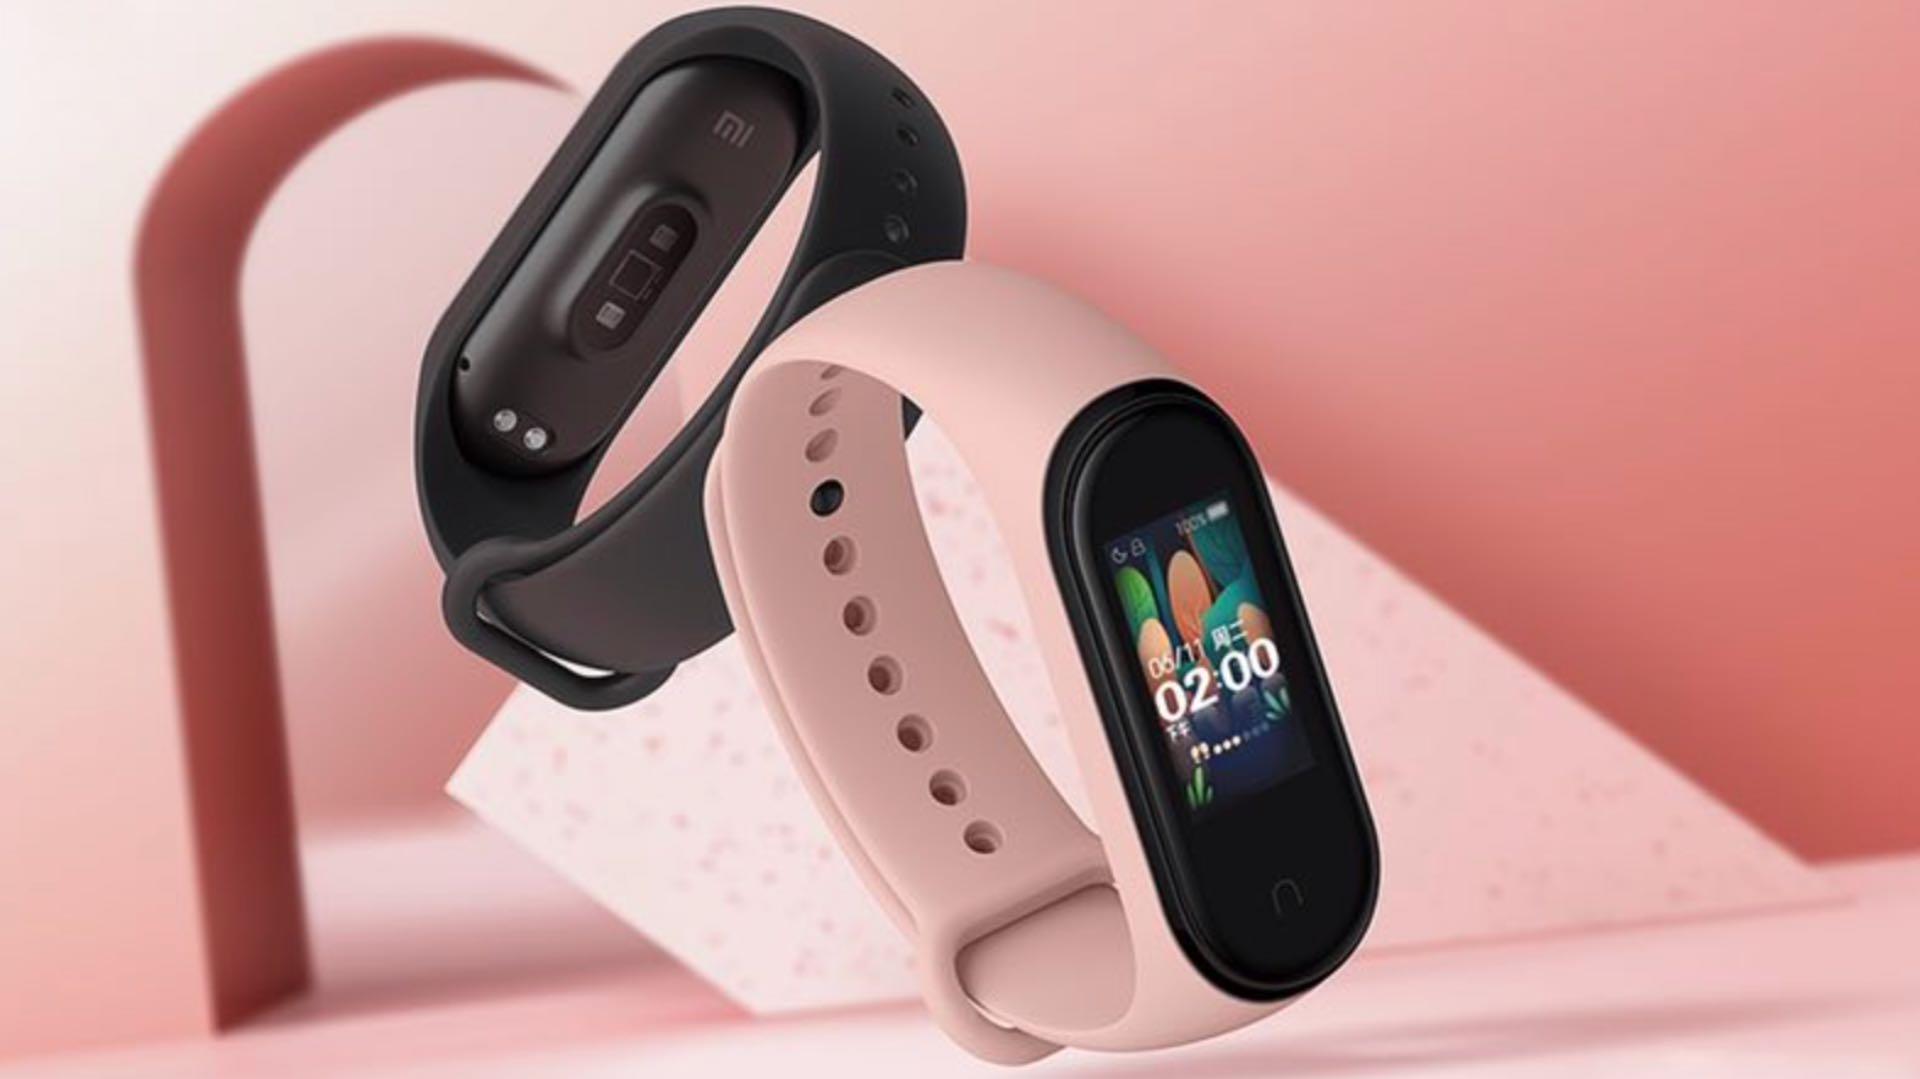 Xiaomi Mi Smart Band 4 / Xiaomi Mi Band 4